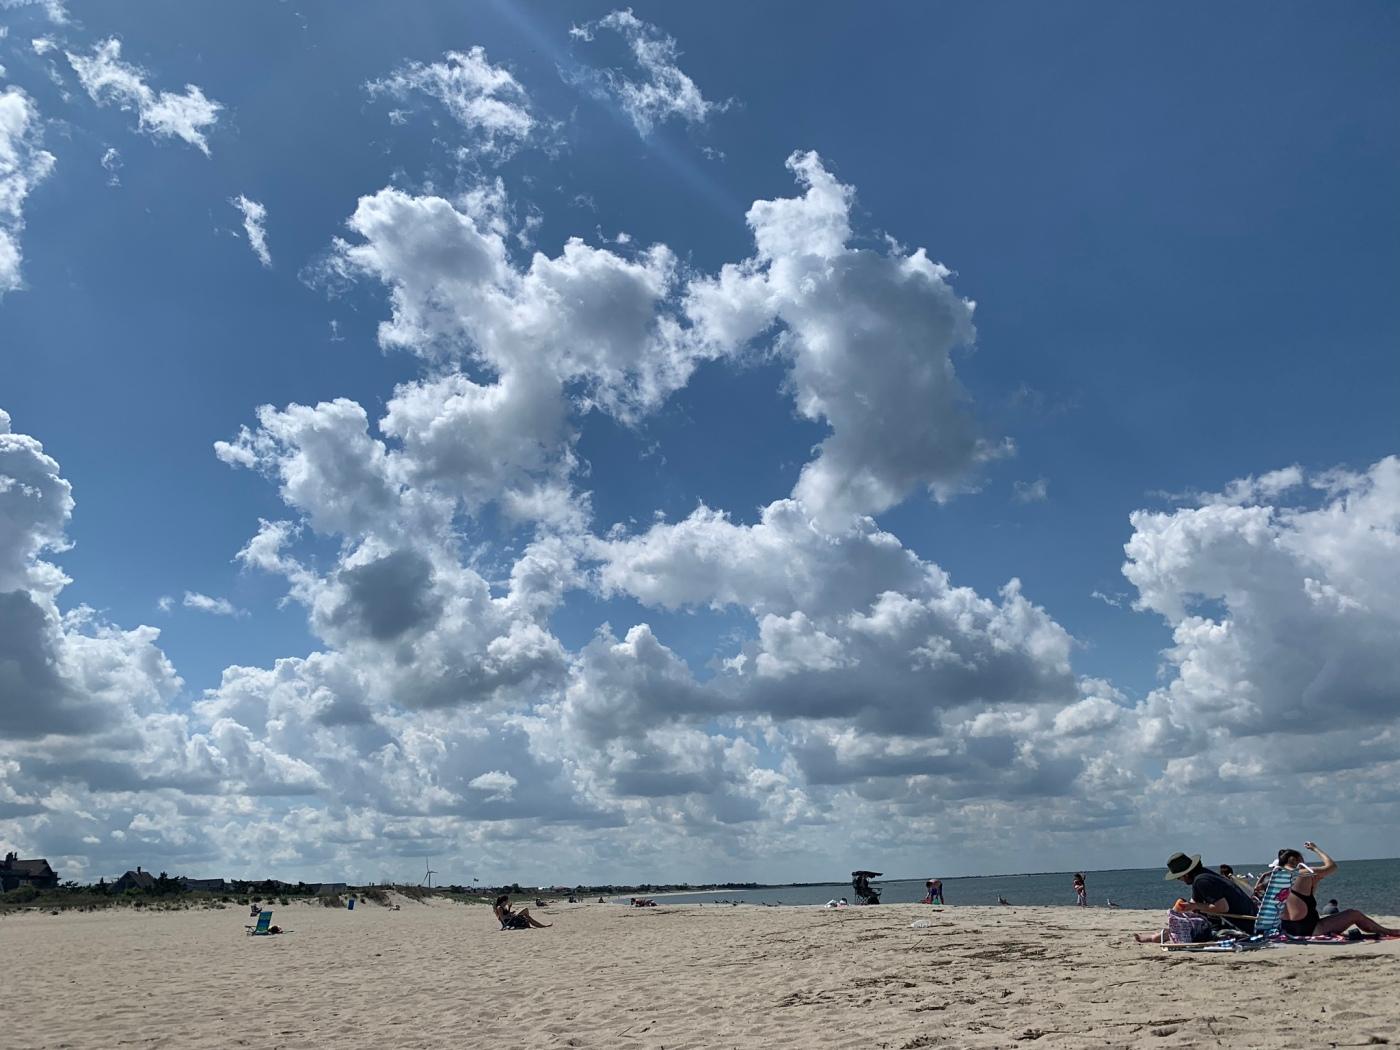 Beach Day in OCMD